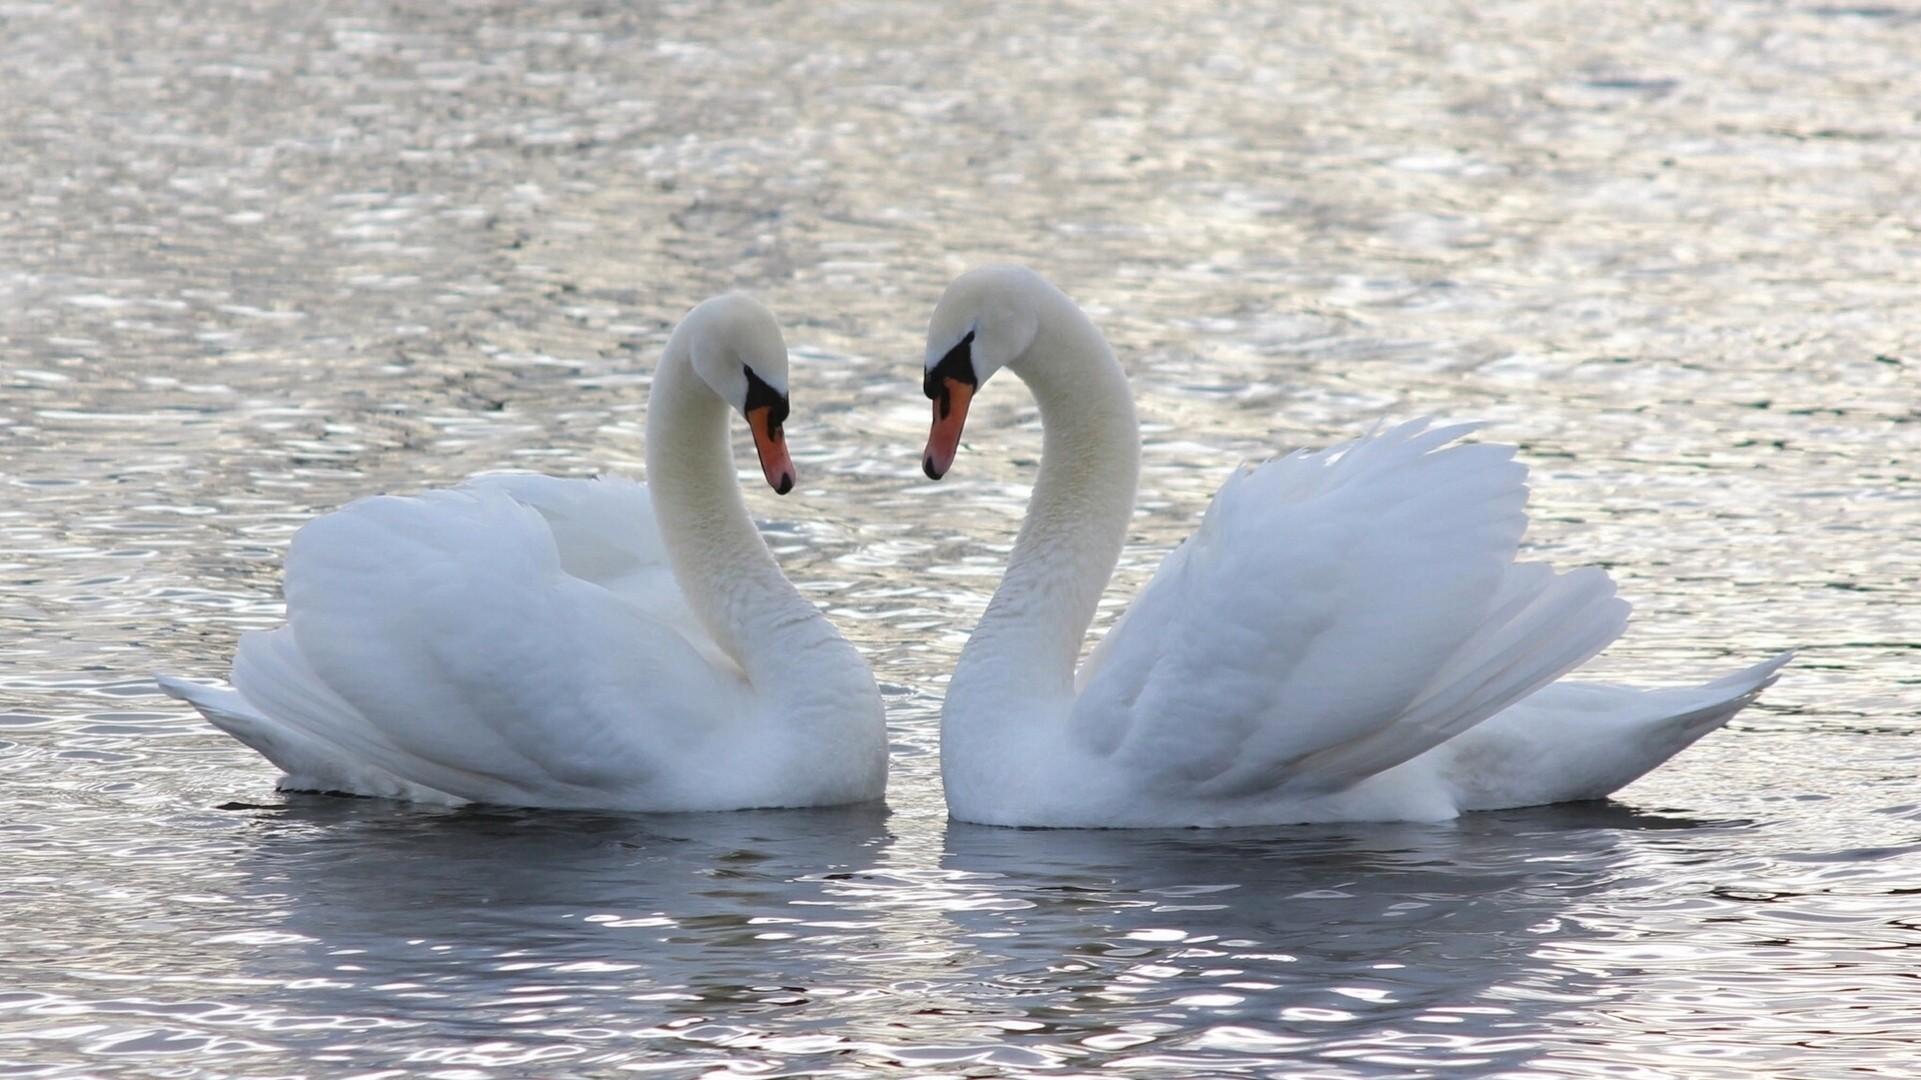 любовь столик озеро пара love table the lake pair без смс